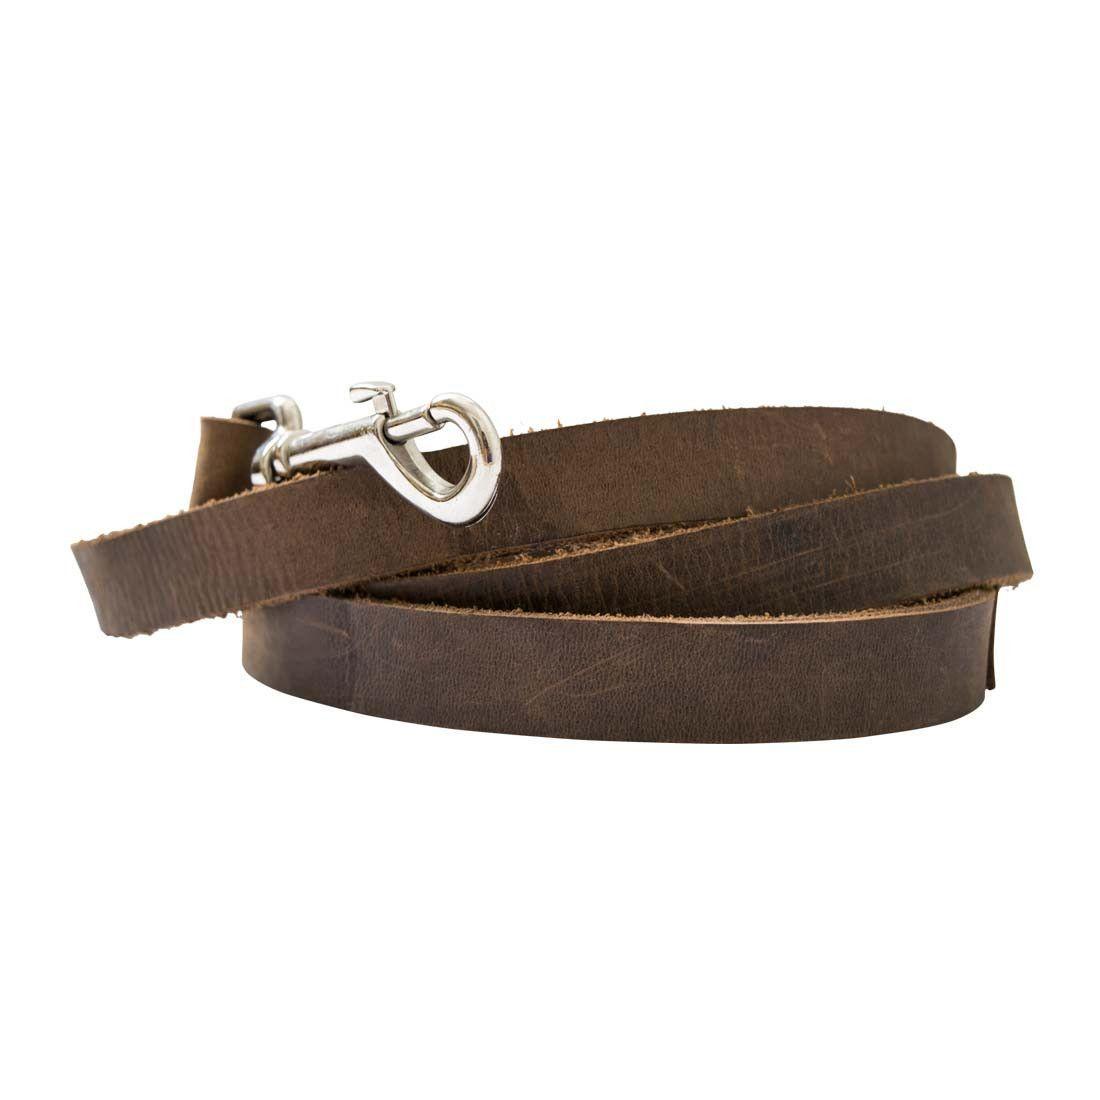 Rustic Leather Dog Leash (6 feet)